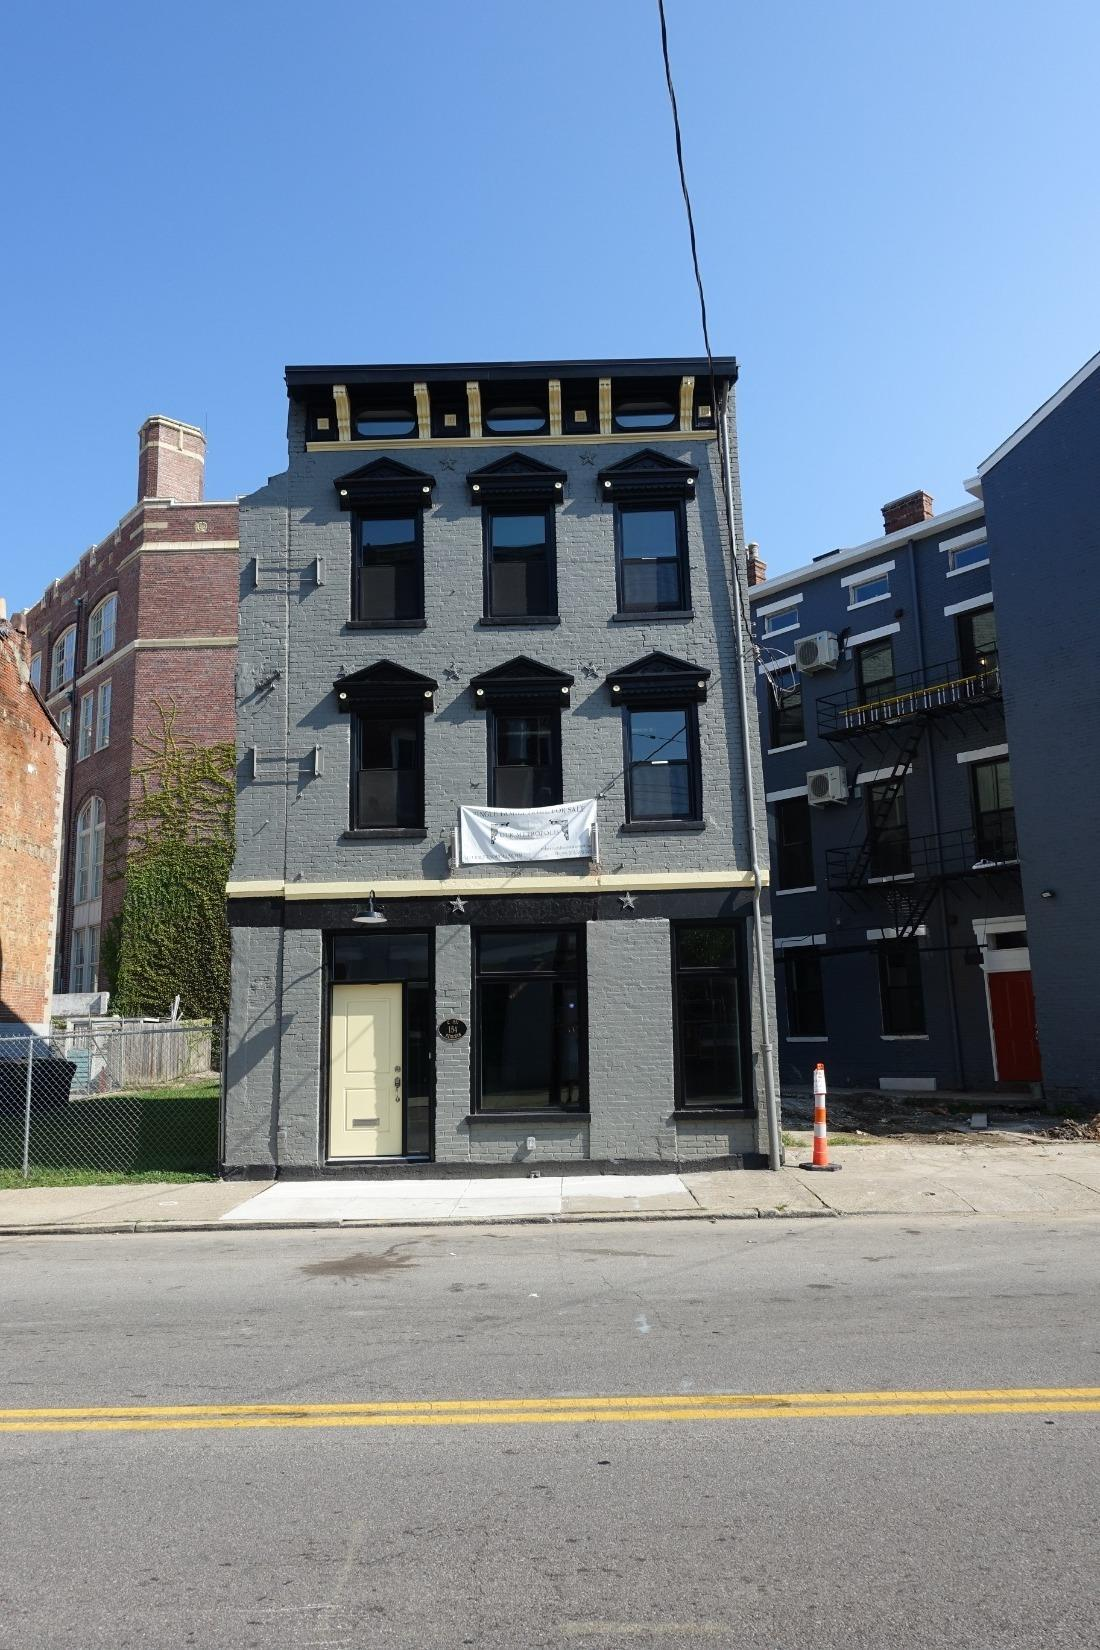 Property for sale at 154 E Mcmicken Avenue, Cincinnati,  OH 45202